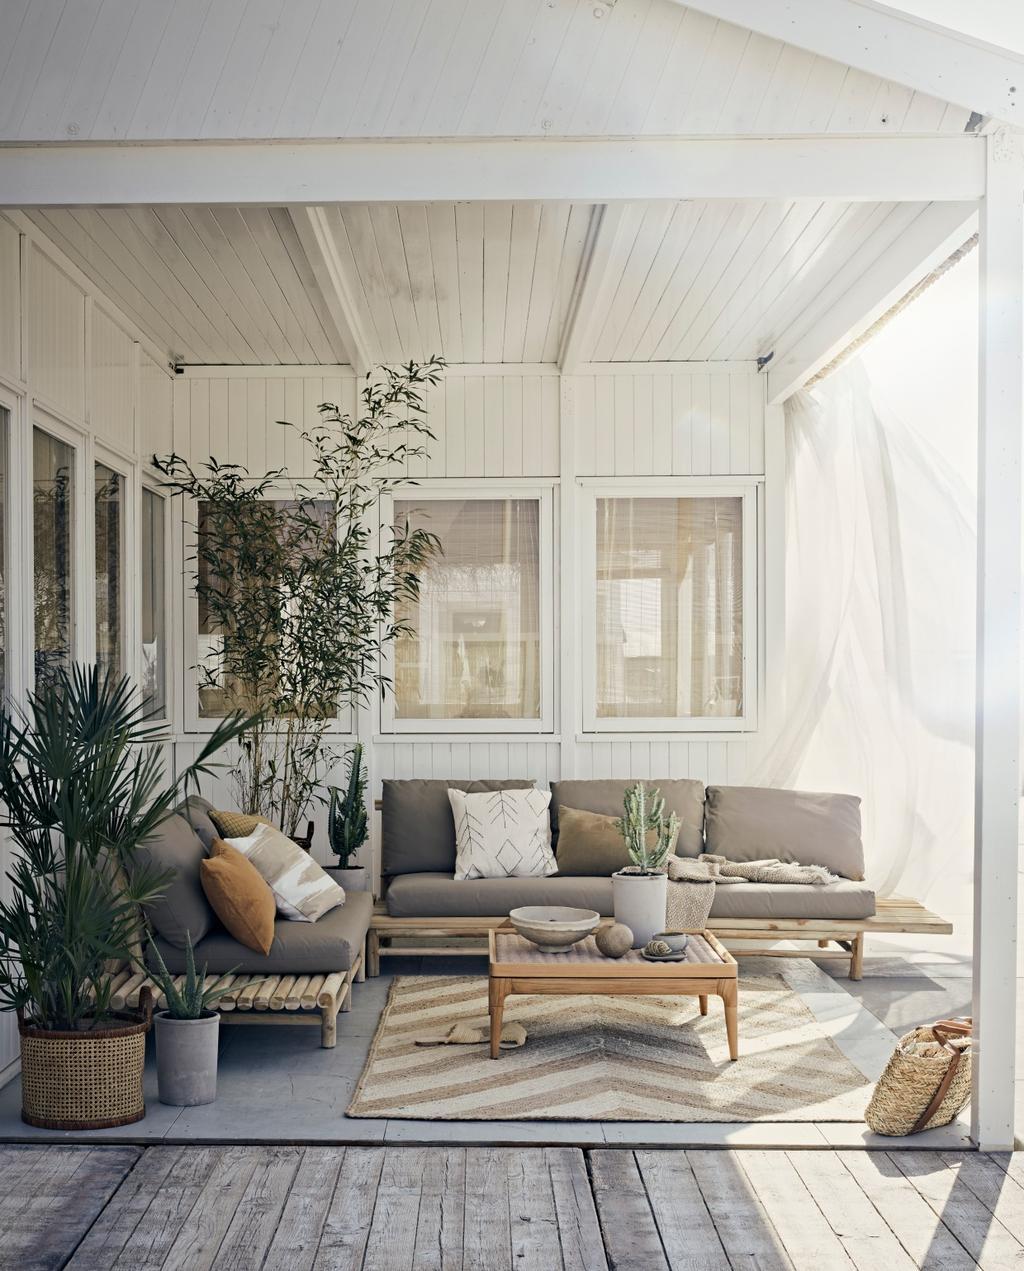 vtwonen styling 06-2020 strand ajuma rieten loungebank met grijze kussens